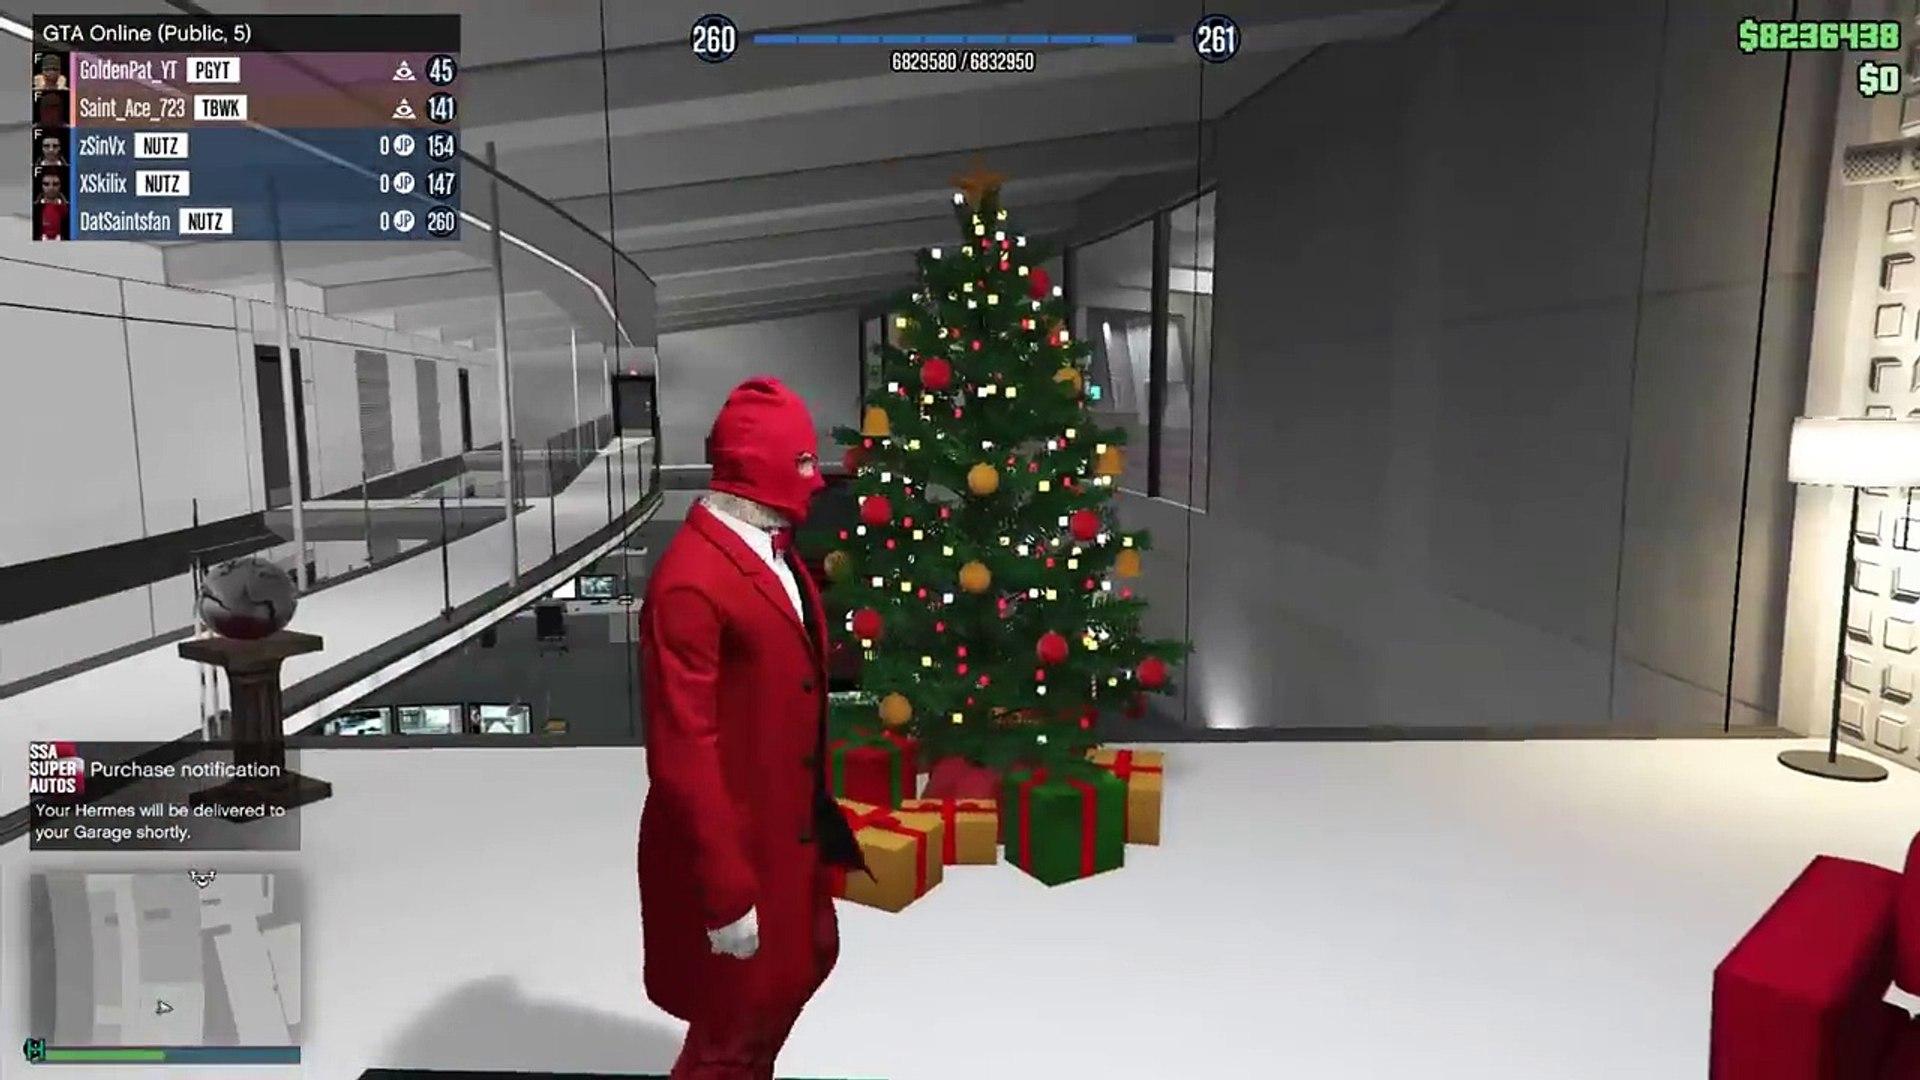 Gta 5 Christmas.Gta Online Free Christmas Gift Charging People Money Rockstar Giving Back Millions